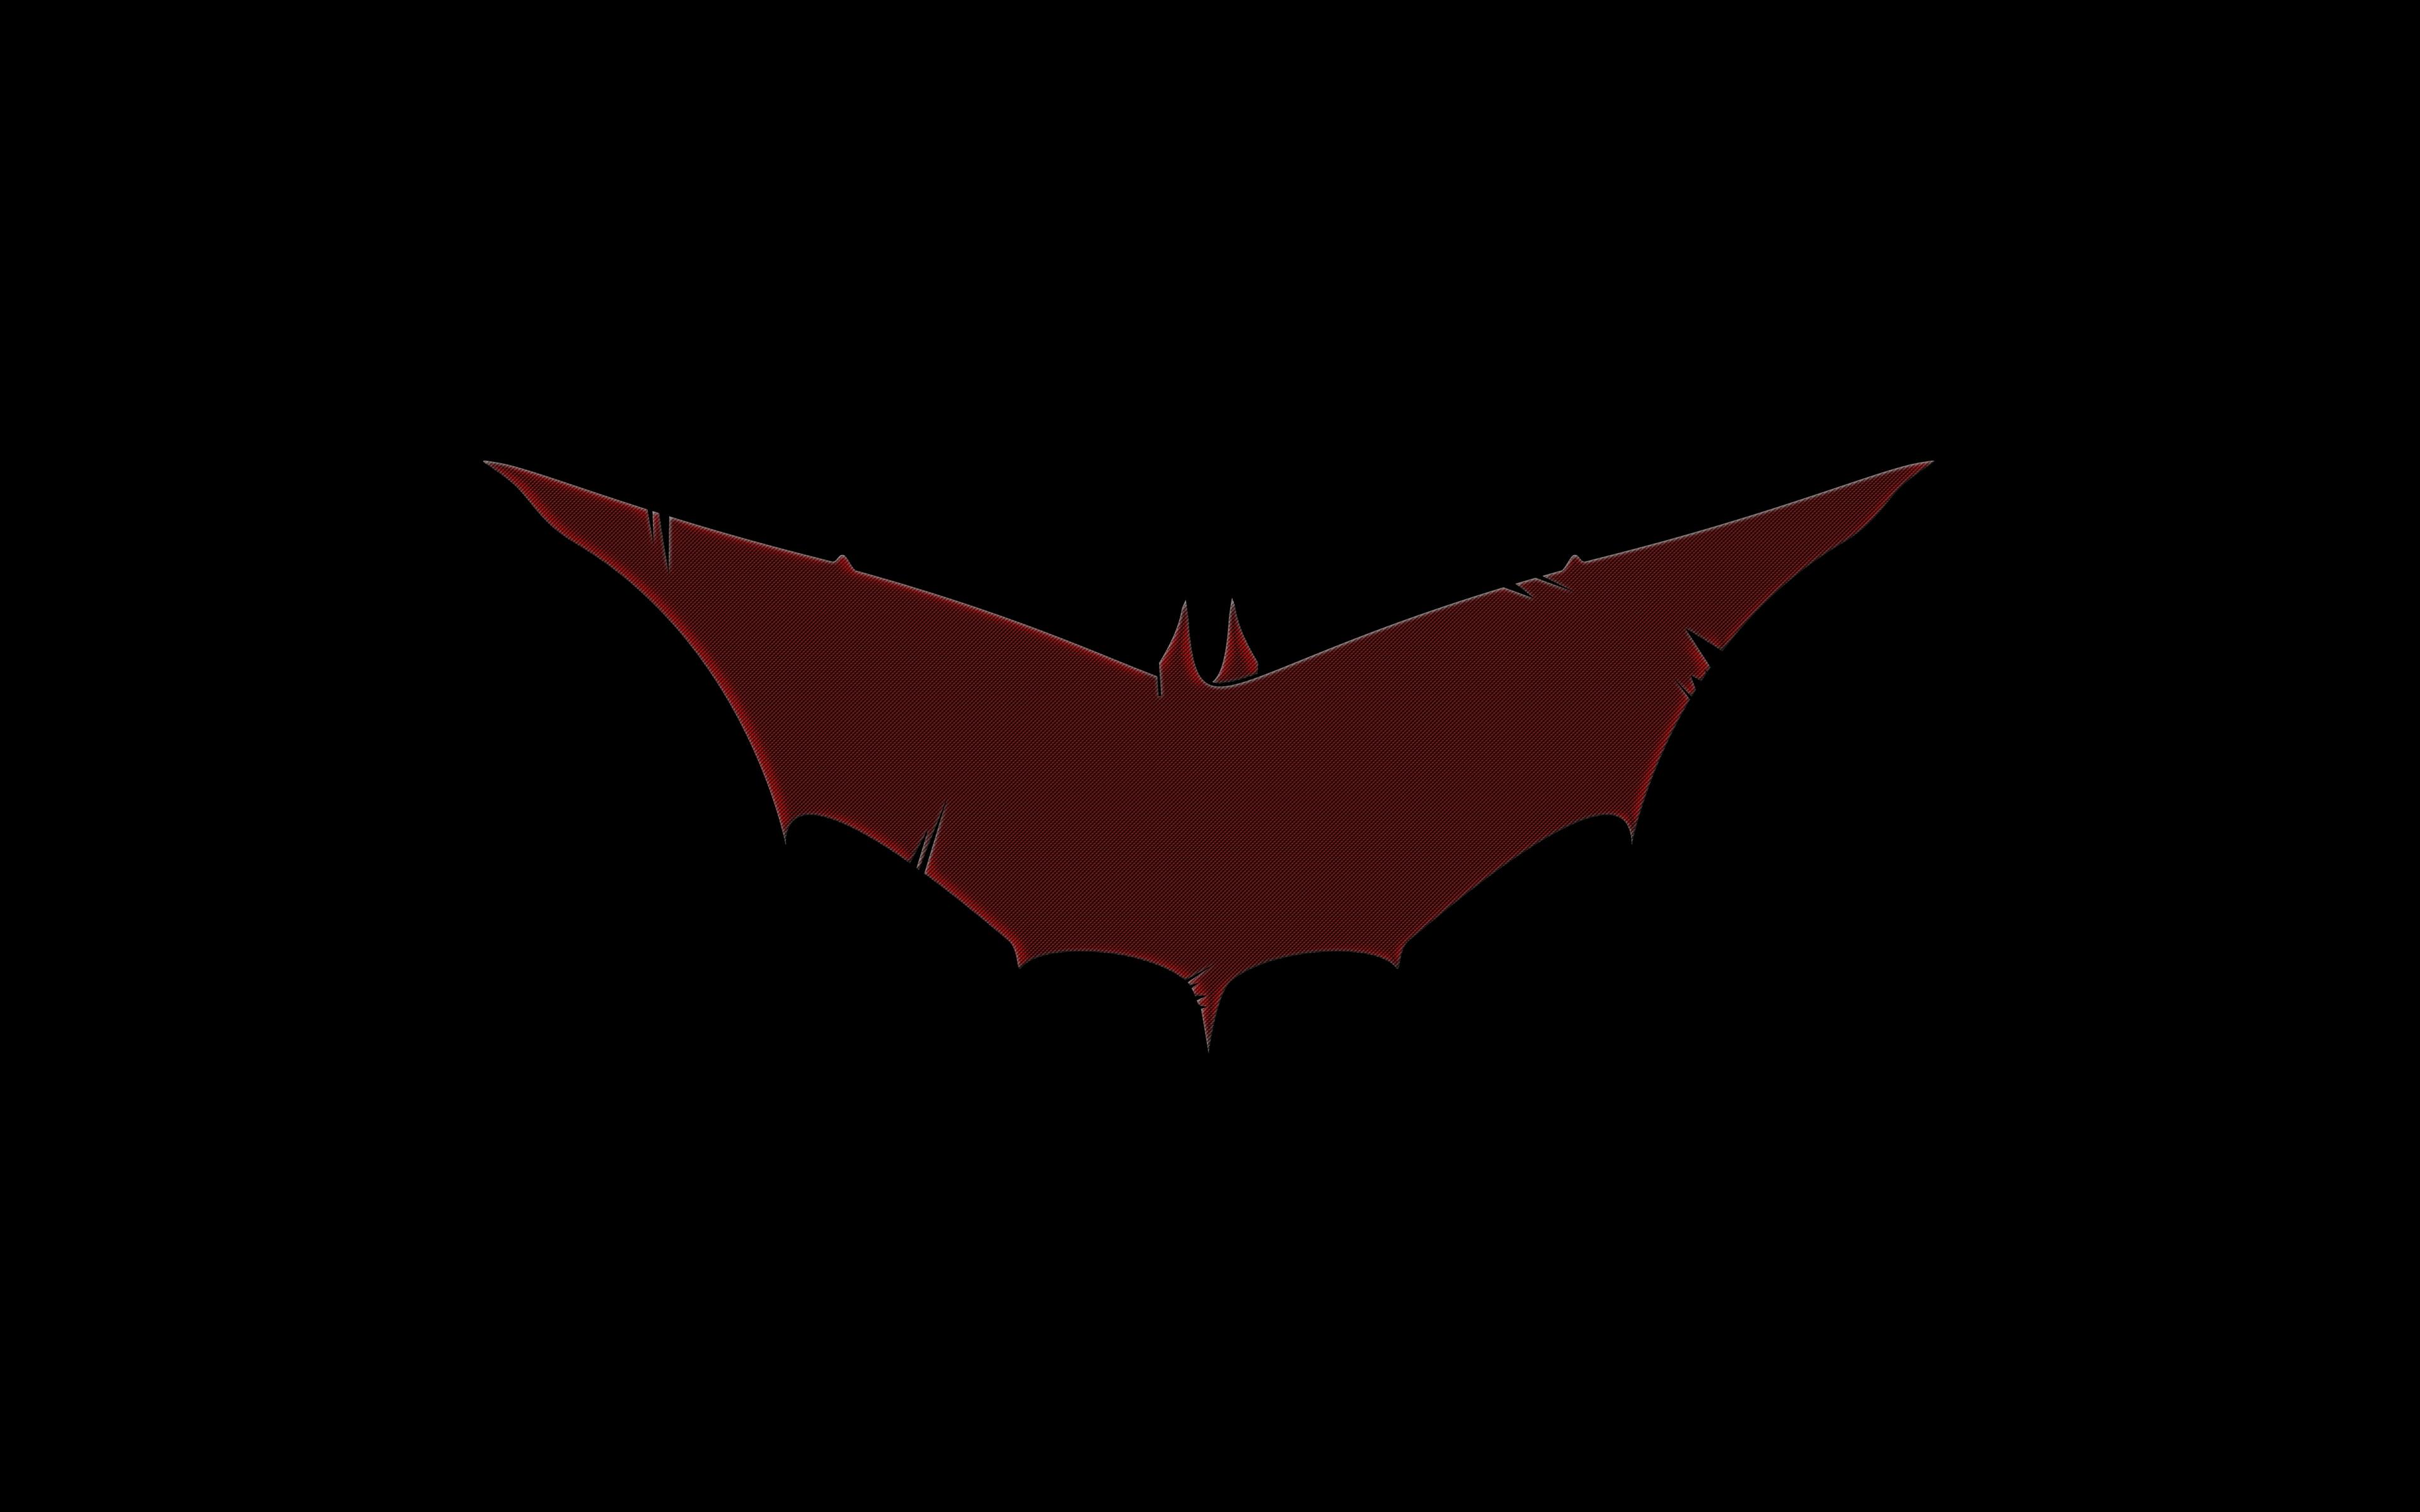 batman-red-logo-8k-tq.jpg